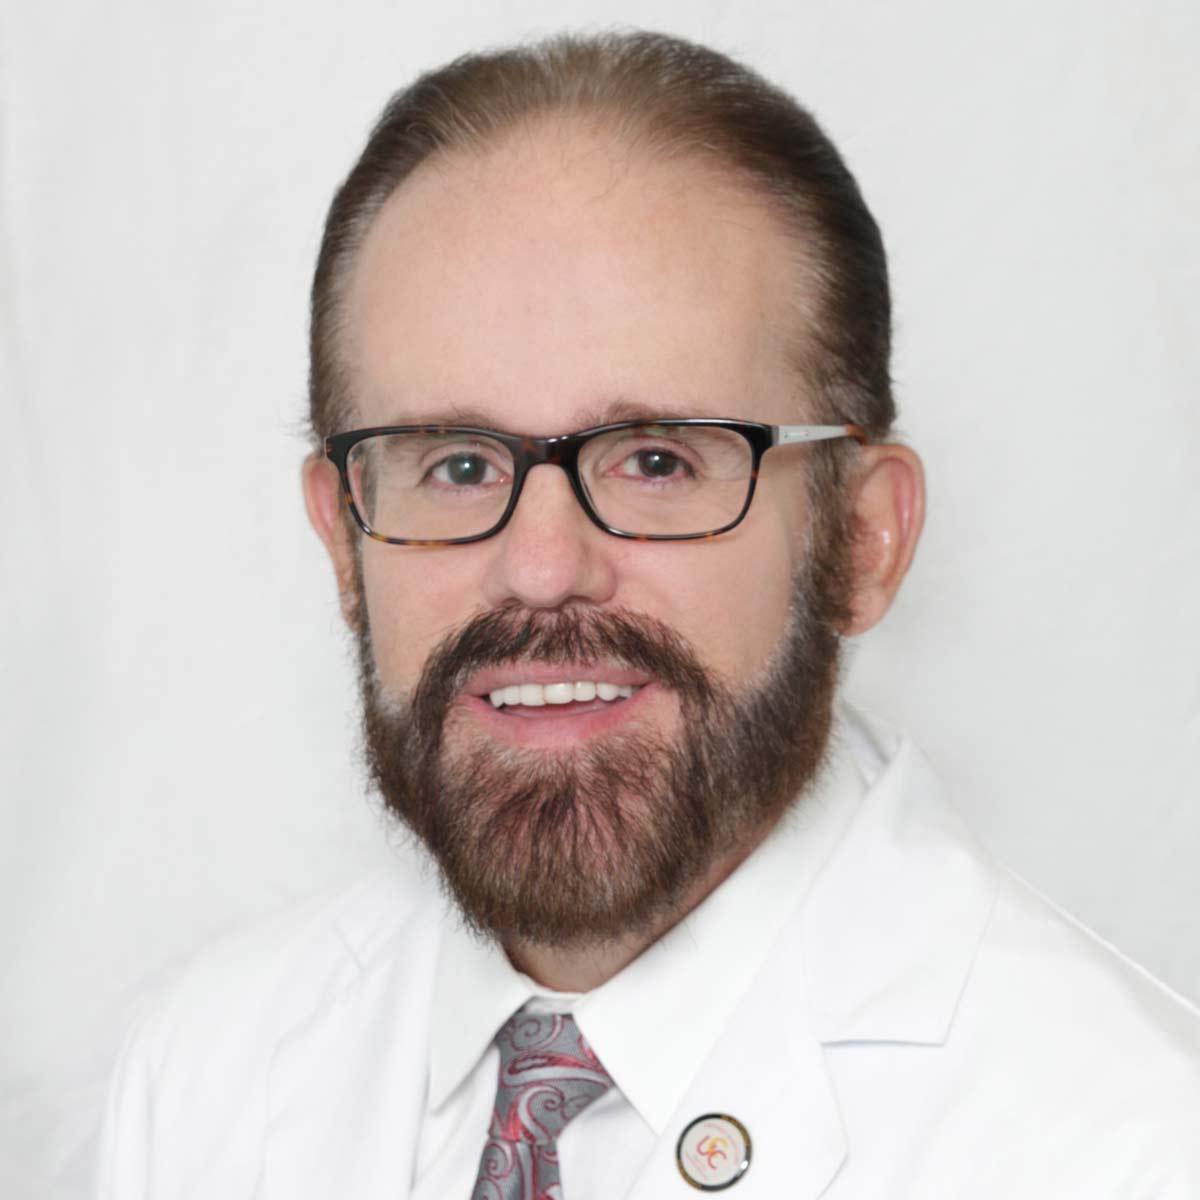 Dr. Ramon Rego - Access Medical Associates Branchburg NJ